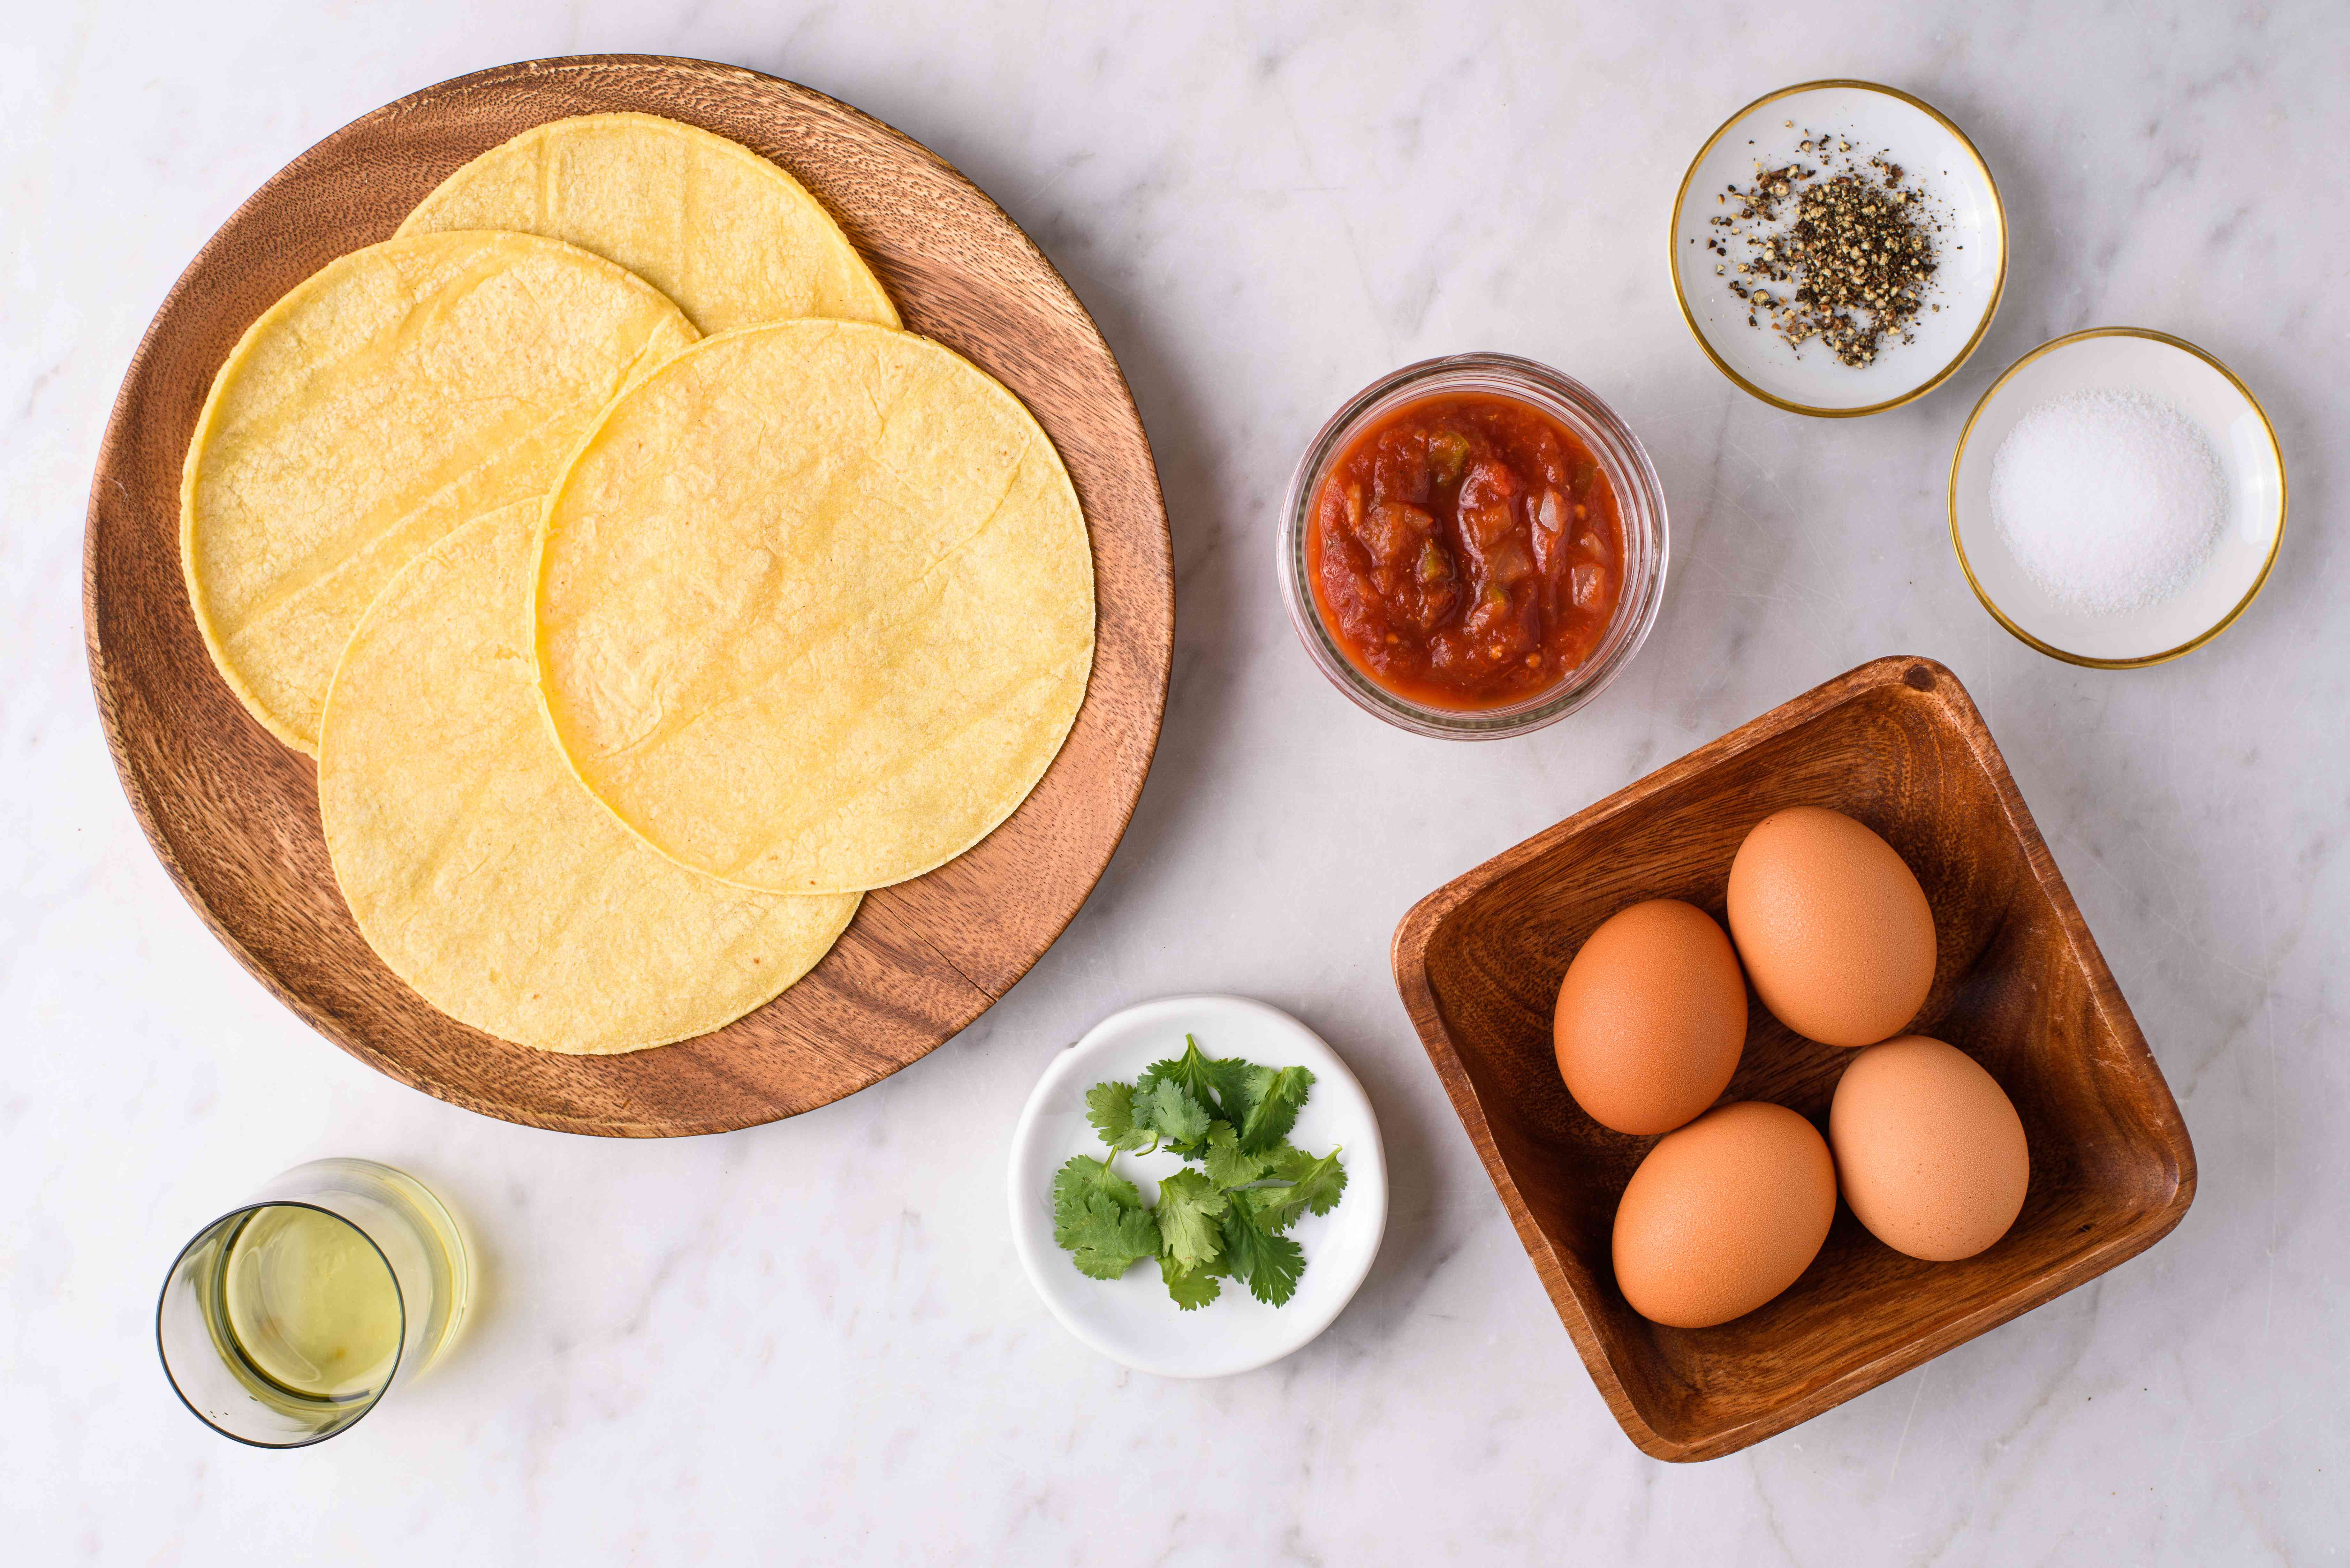 Ingredients for huevos rancheros